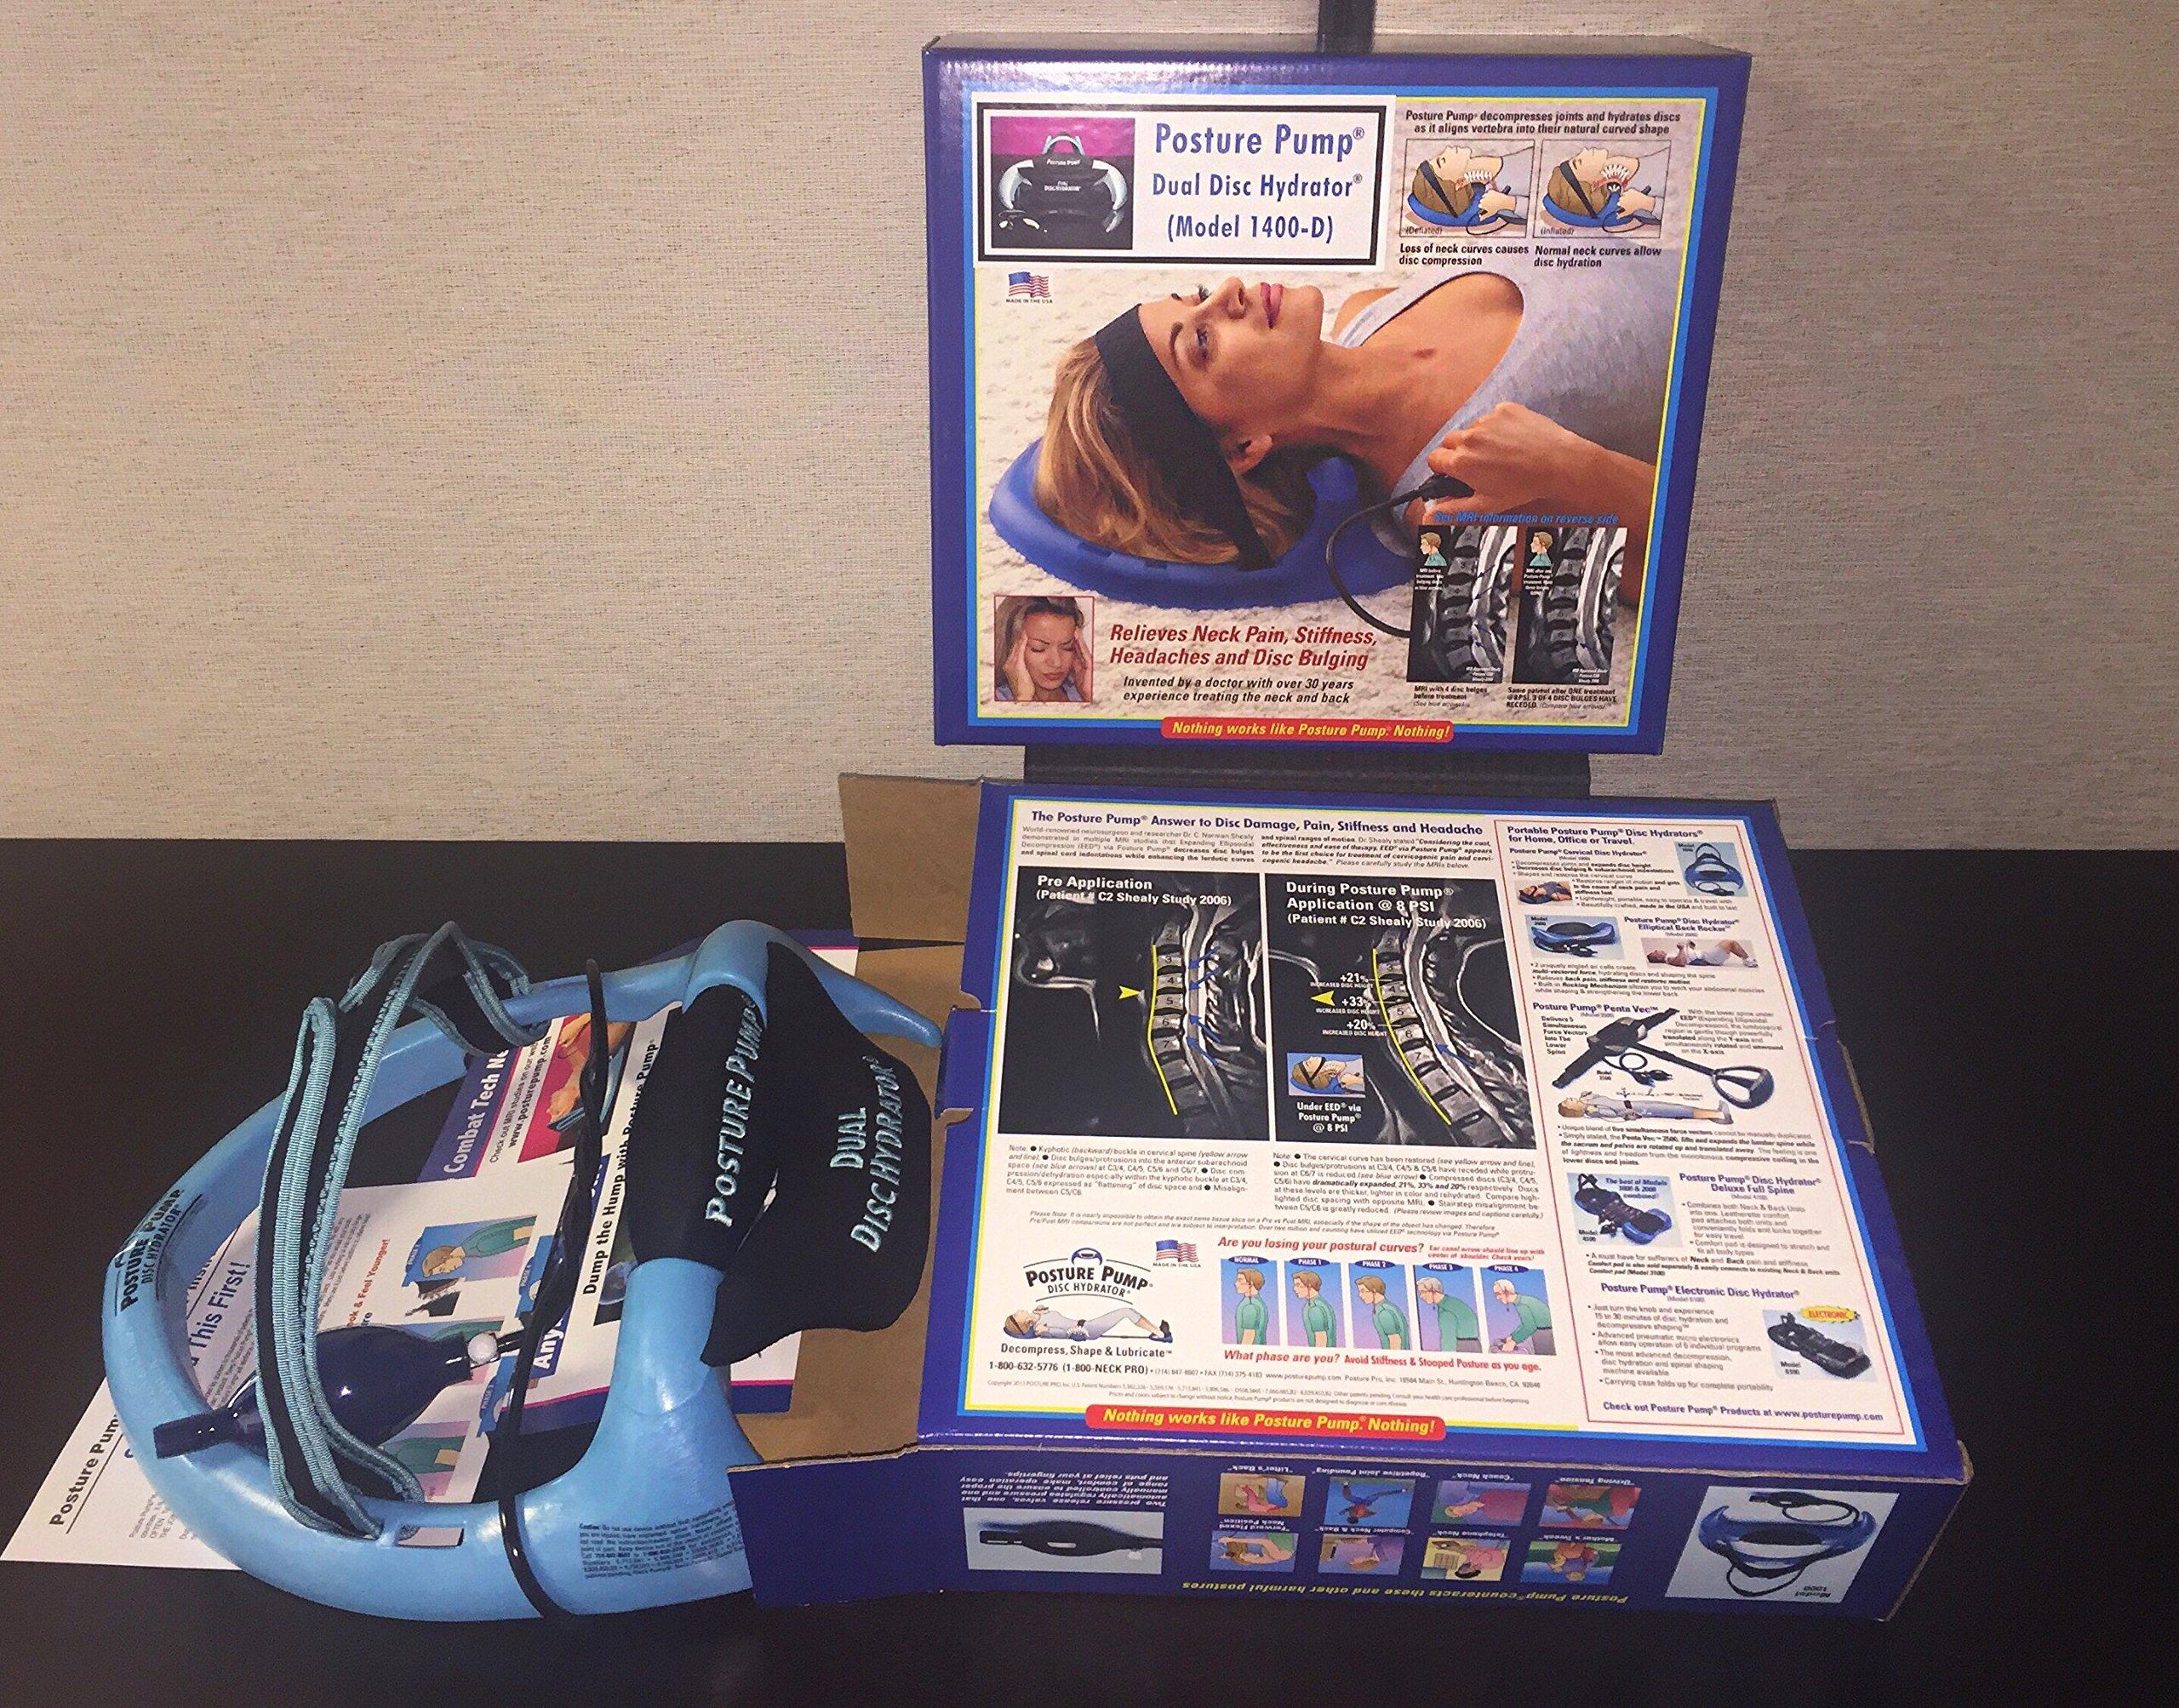 Posture Pump® 1400-D (Dual Disc Hydrator®) by Posture Pump (Image #3)